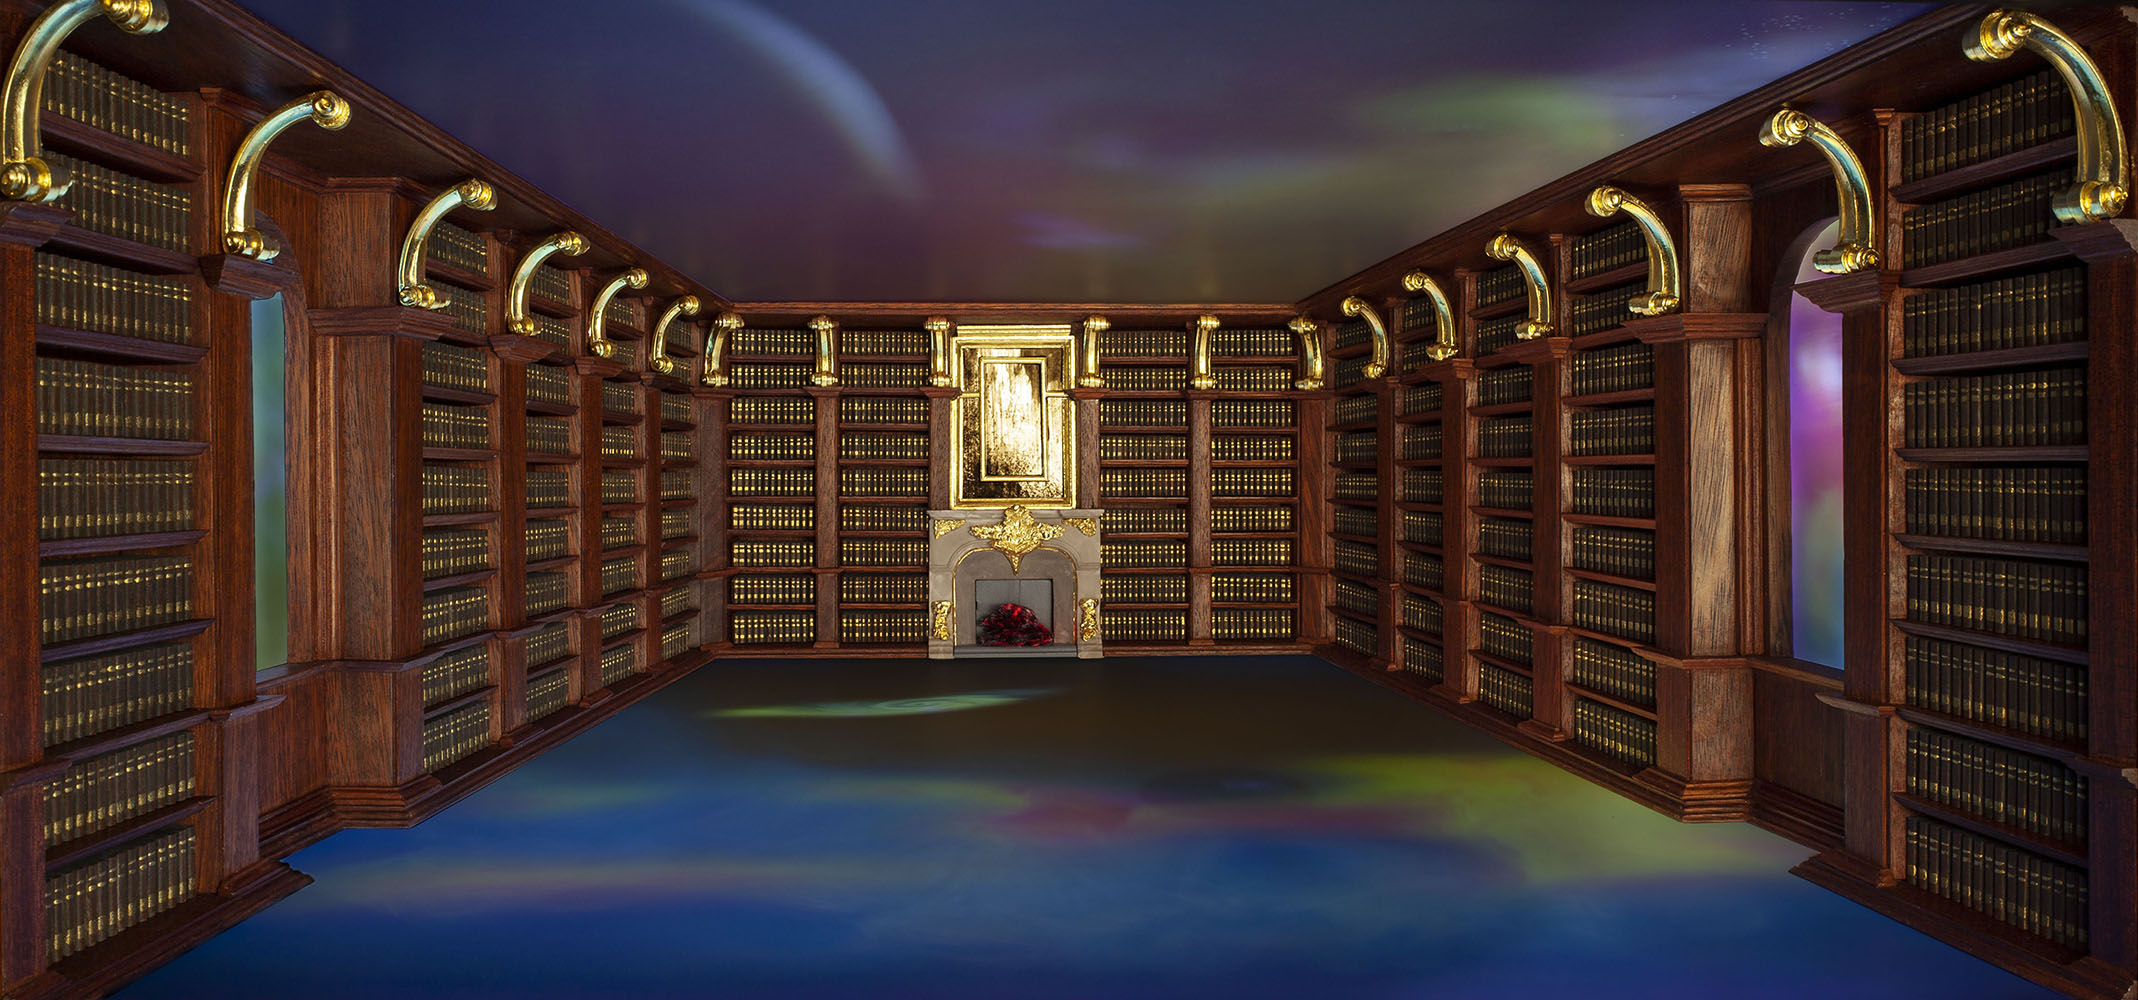 La Bibliothèque, 2018